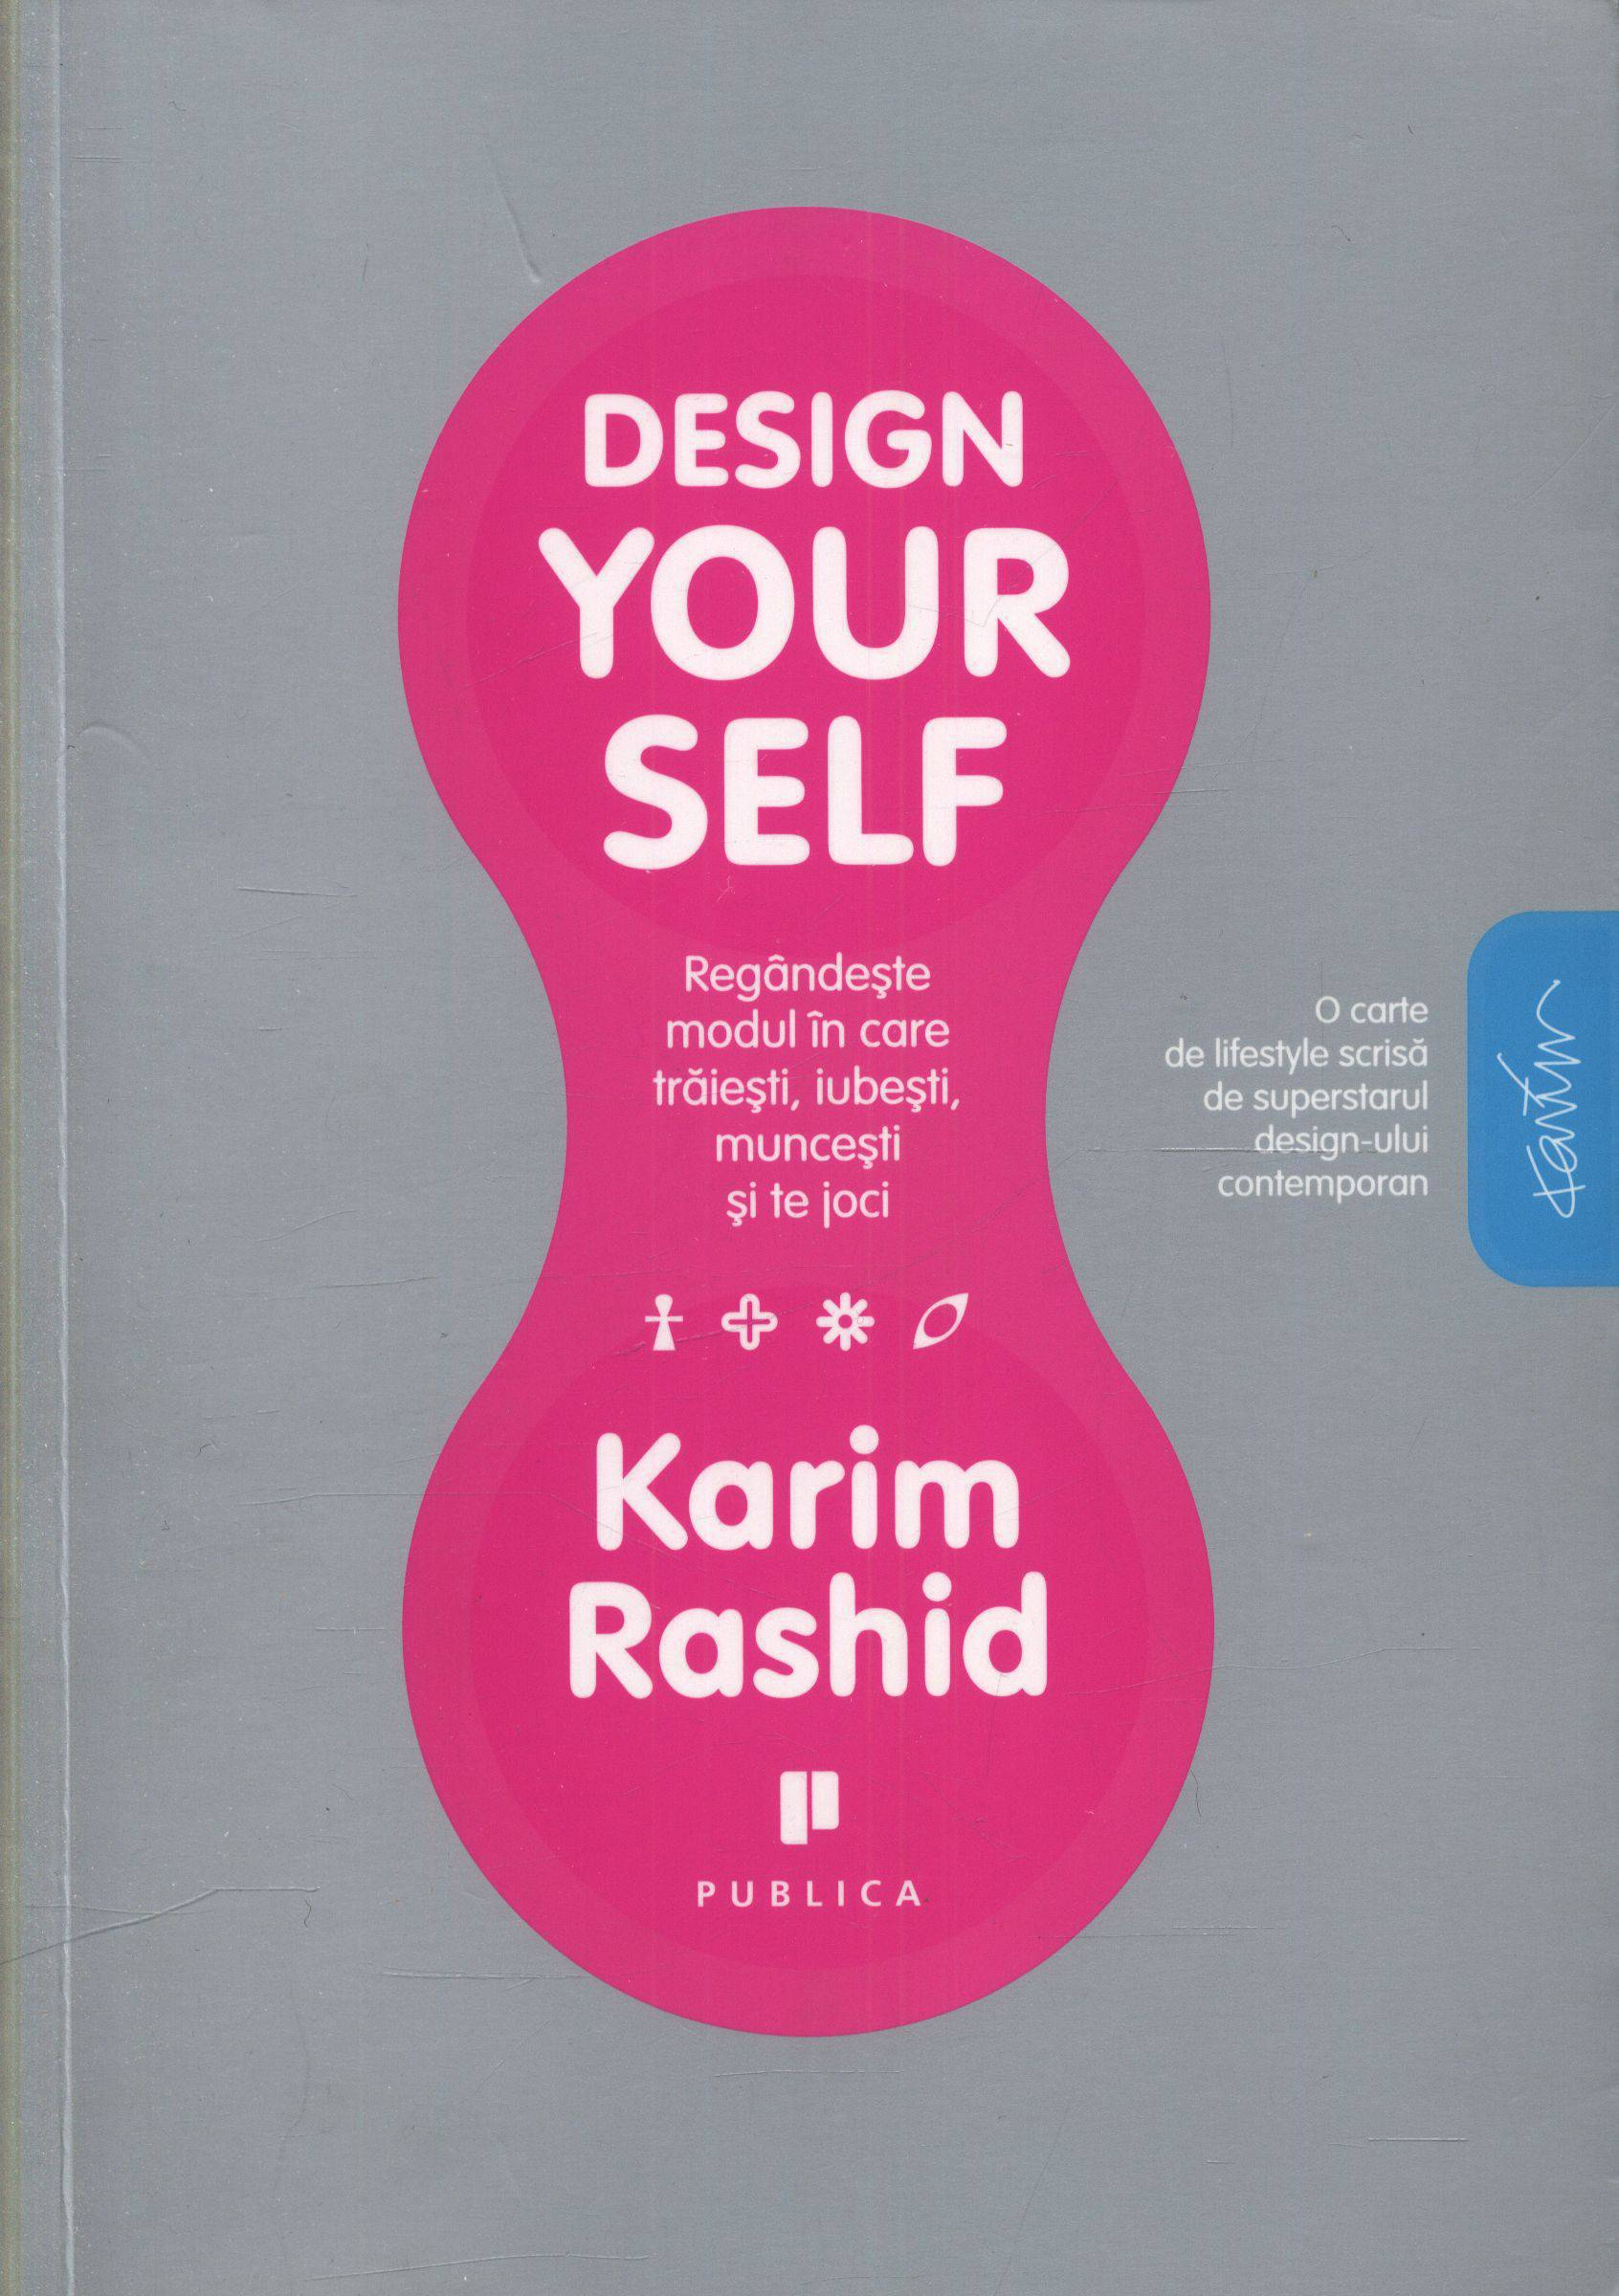 design yourself karim rashid pdf